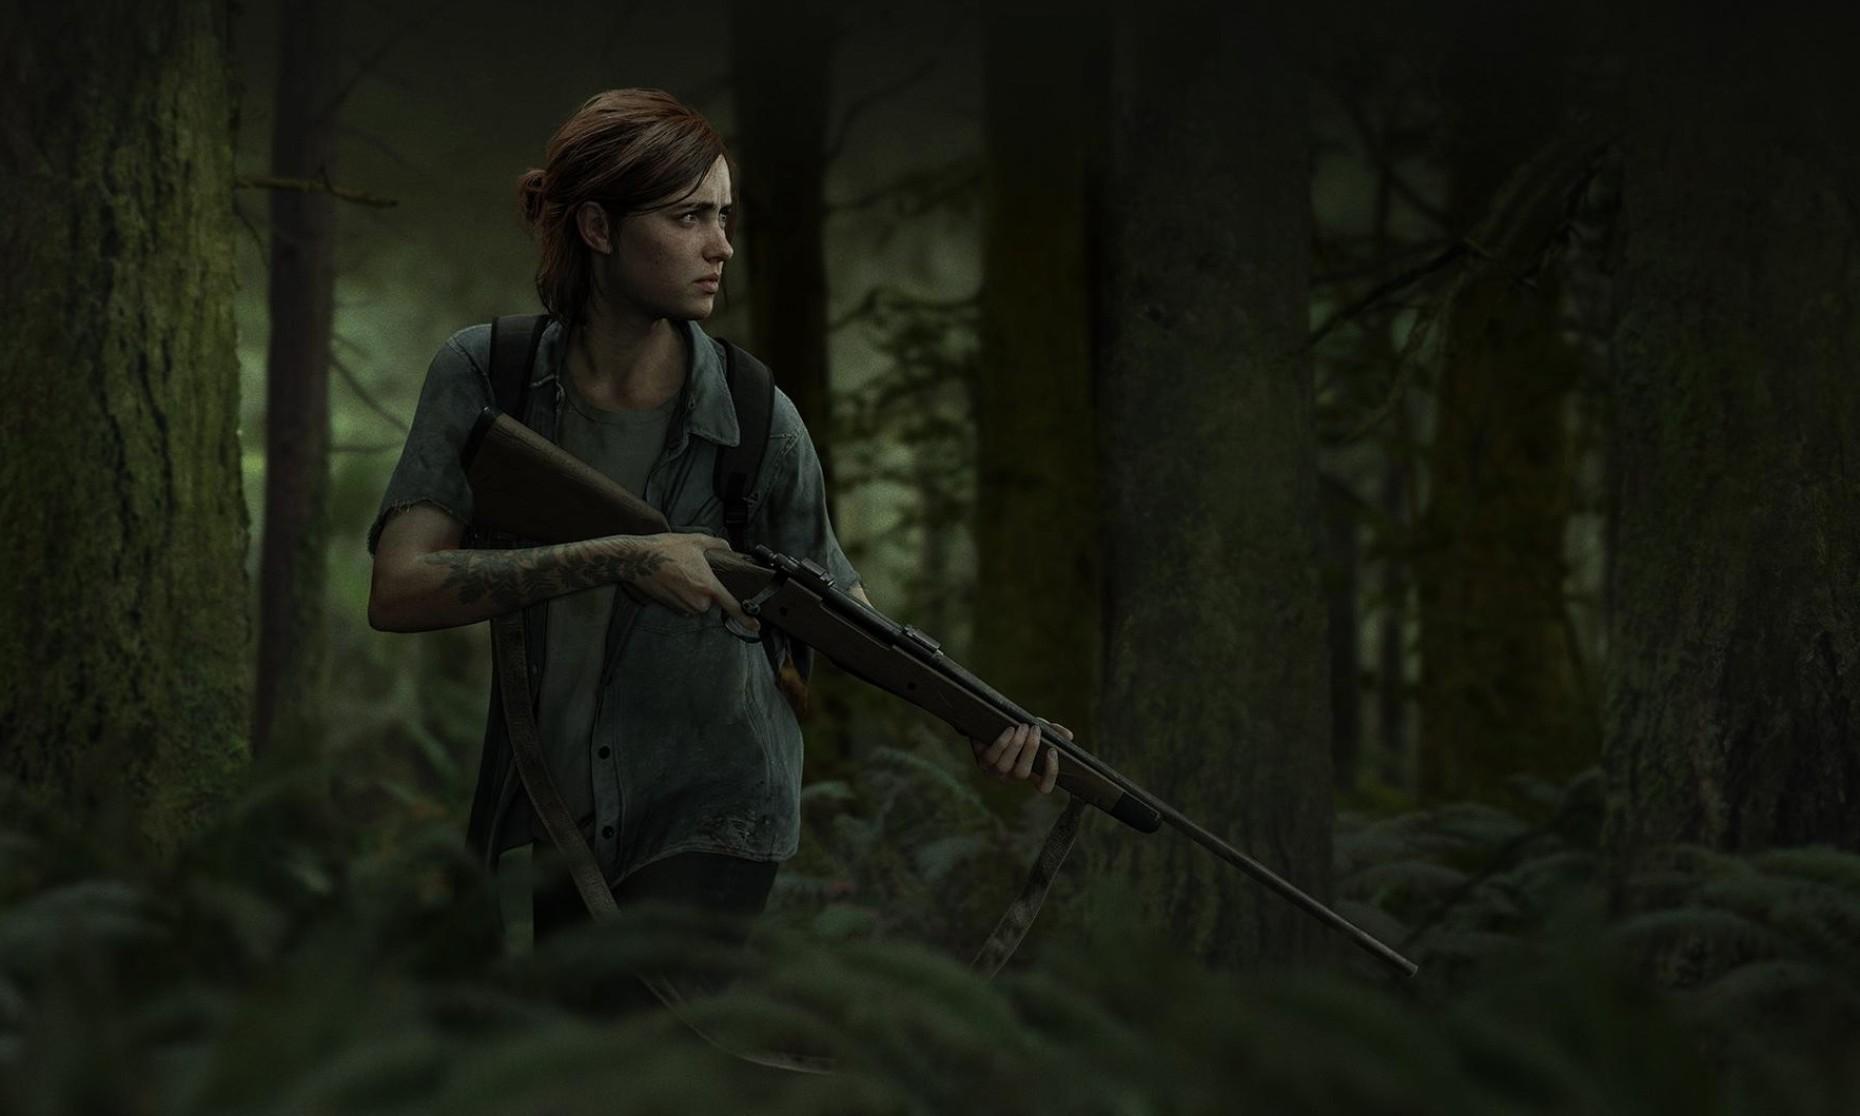 Naughty Dog уверена, что утечки не отразятся на впечатлениях игроков от The Last of Us 2